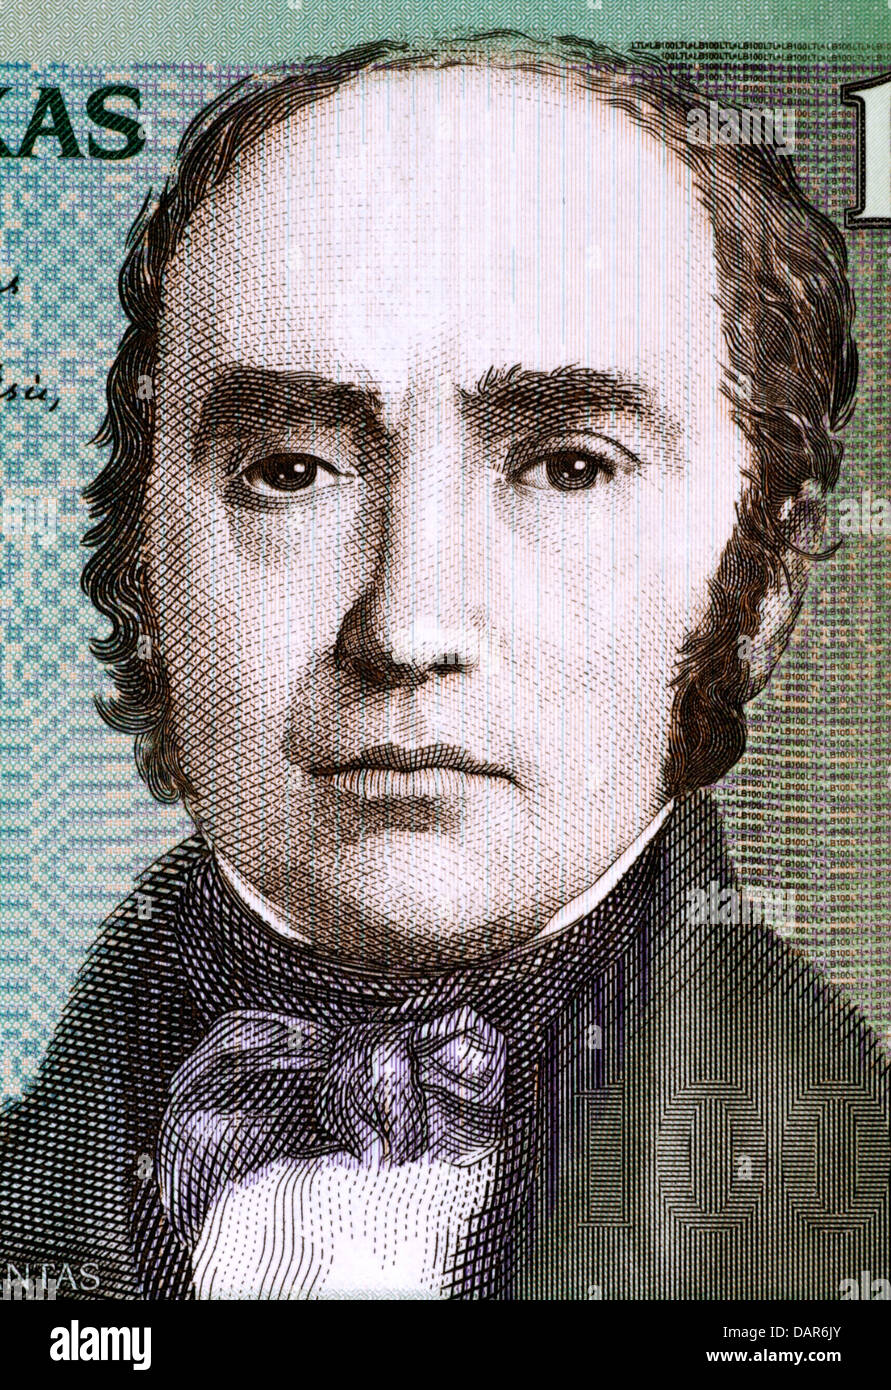 Simonas Daukantas (1793-1864) on 100 Litu 2007 Banknote from Lithuania. Lithuanian writer, ethnographer and historian. - Stock Image